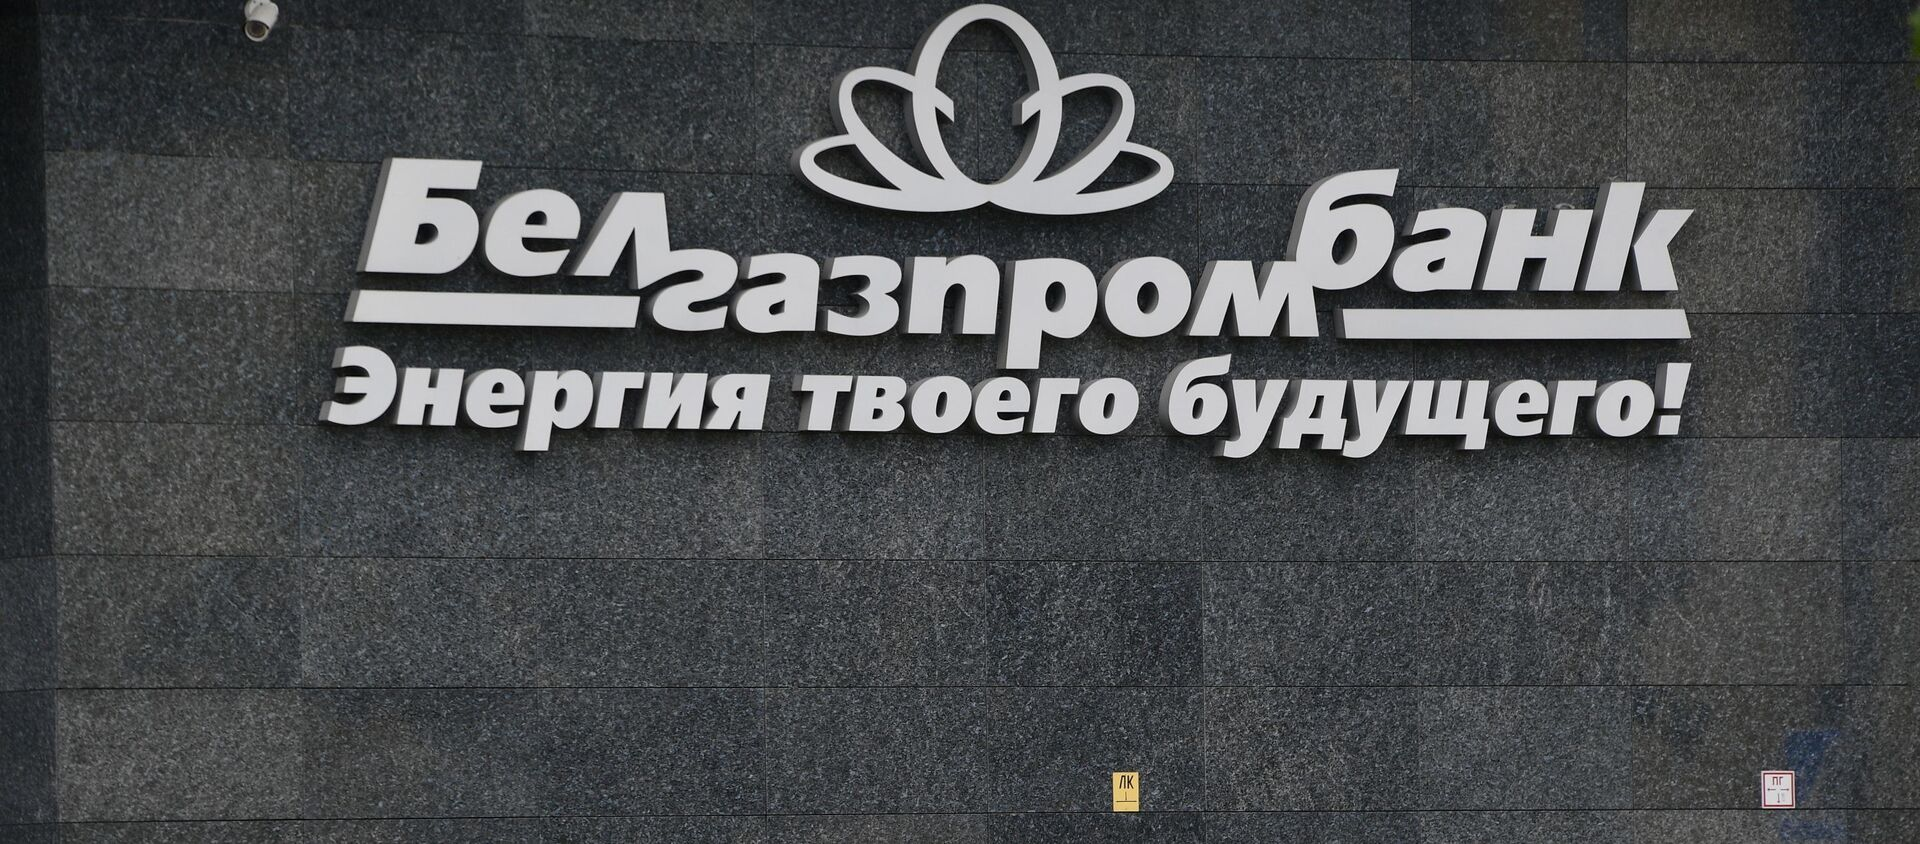 Здание Белгазпромбанка - Sputnik Беларусь, 1920, 25.02.2021